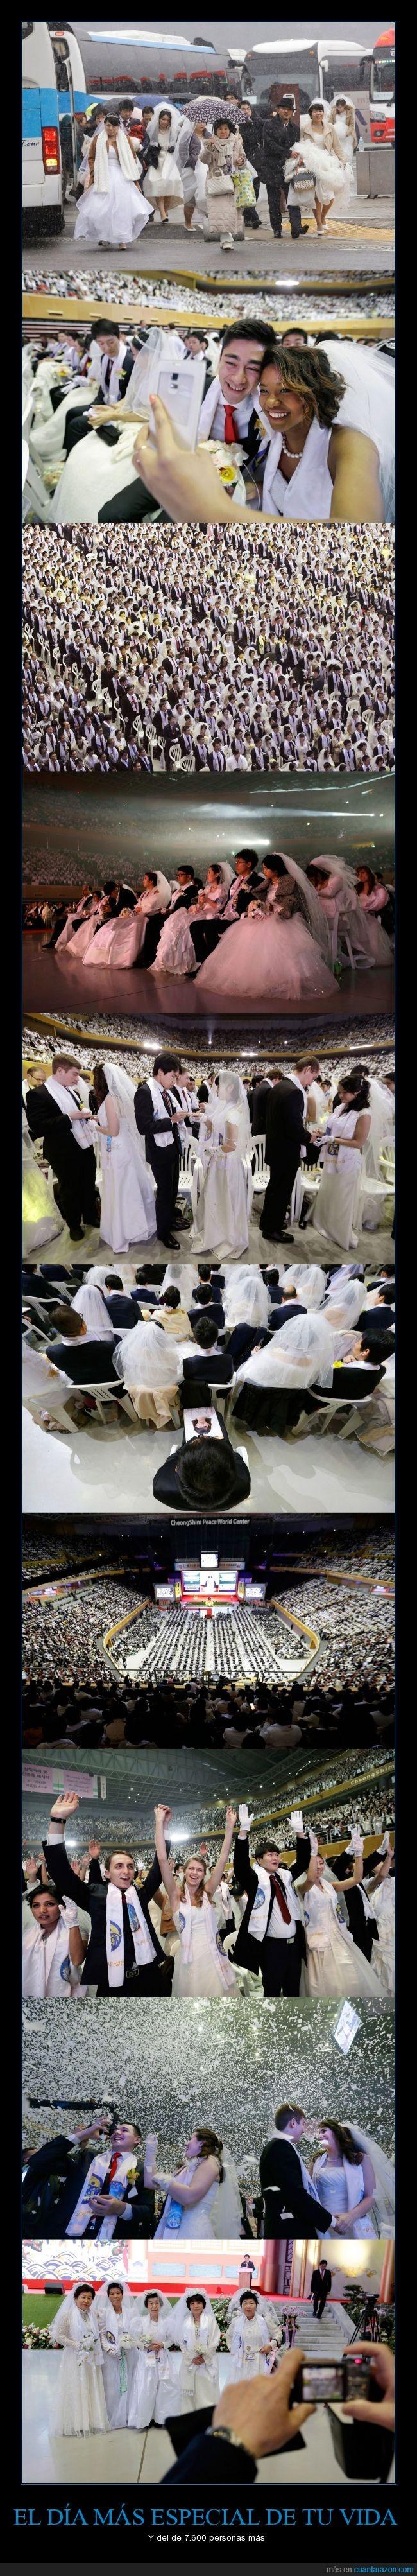 boda,casar,congreso,Corea,masiva,matrimonio,palacio,pareja